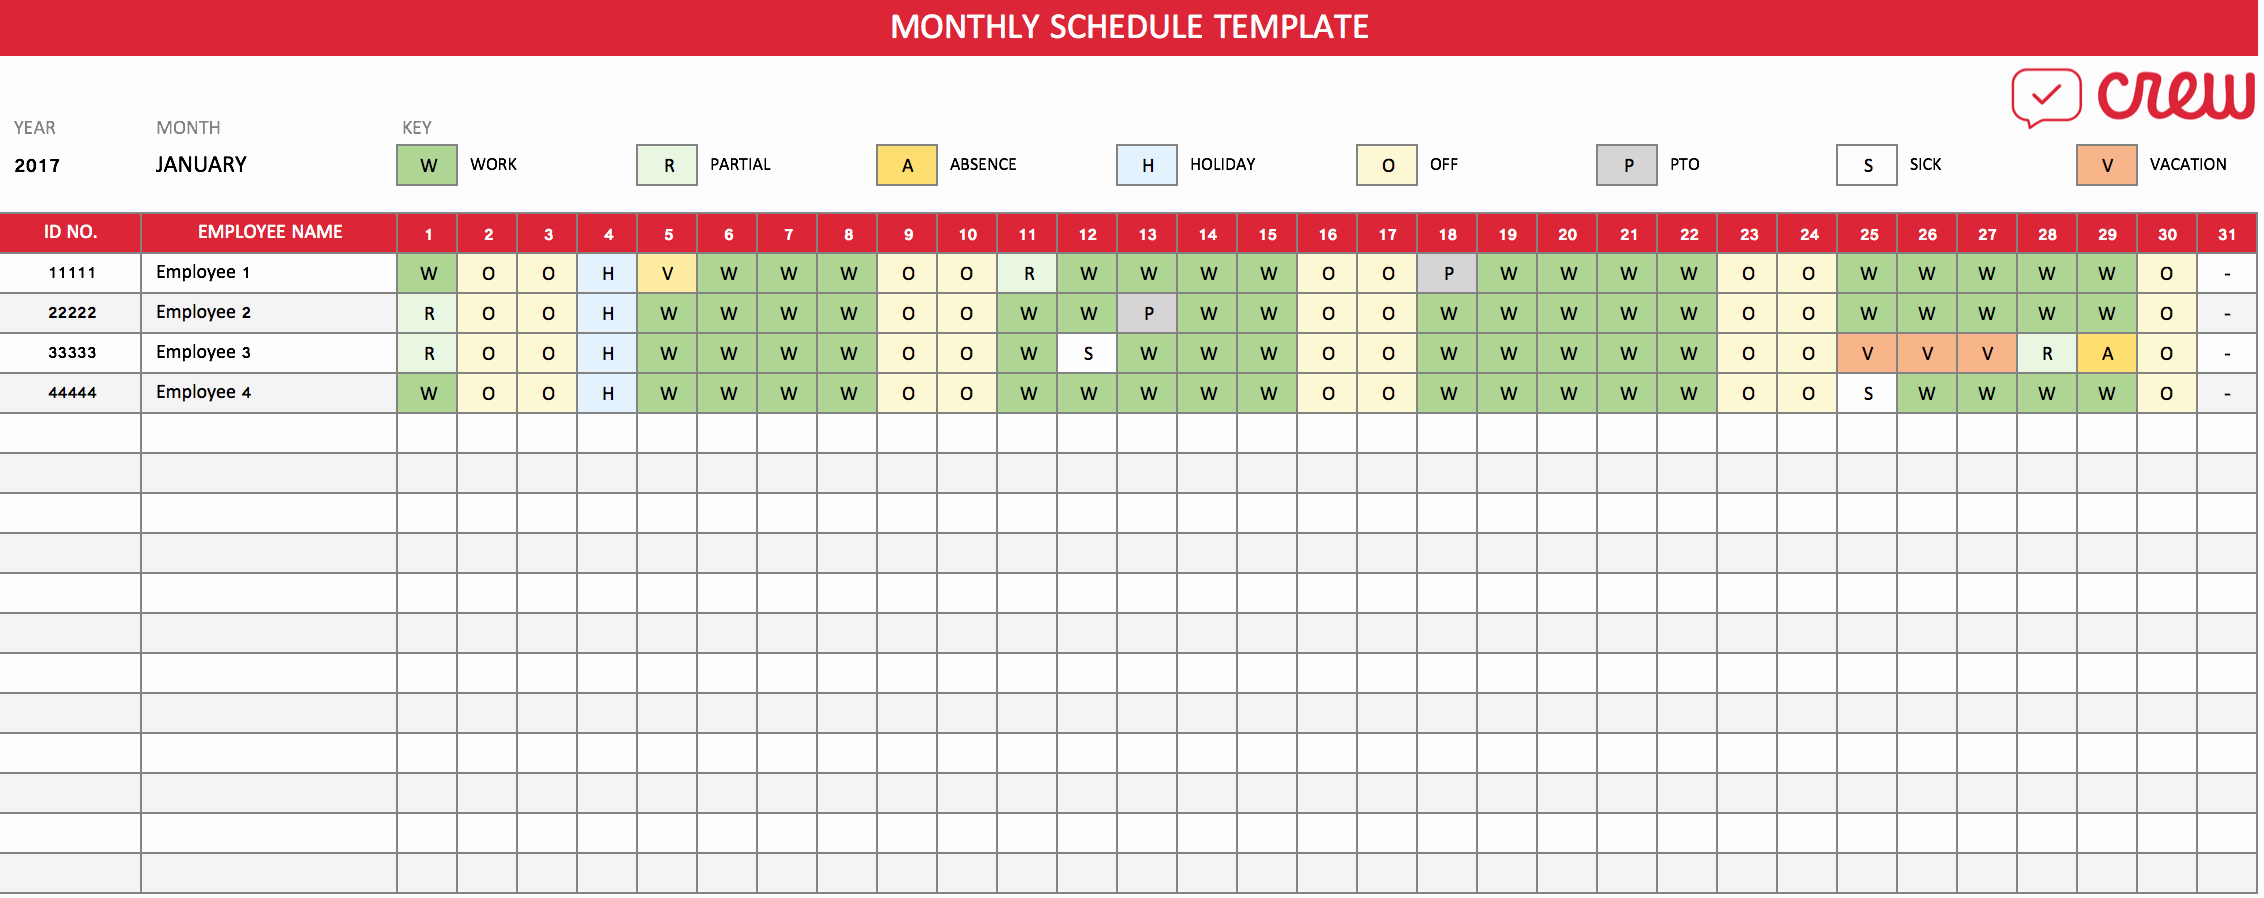 Free Monthly Work Schedule Template Elegant Free Monthly Work Schedule Template Crew